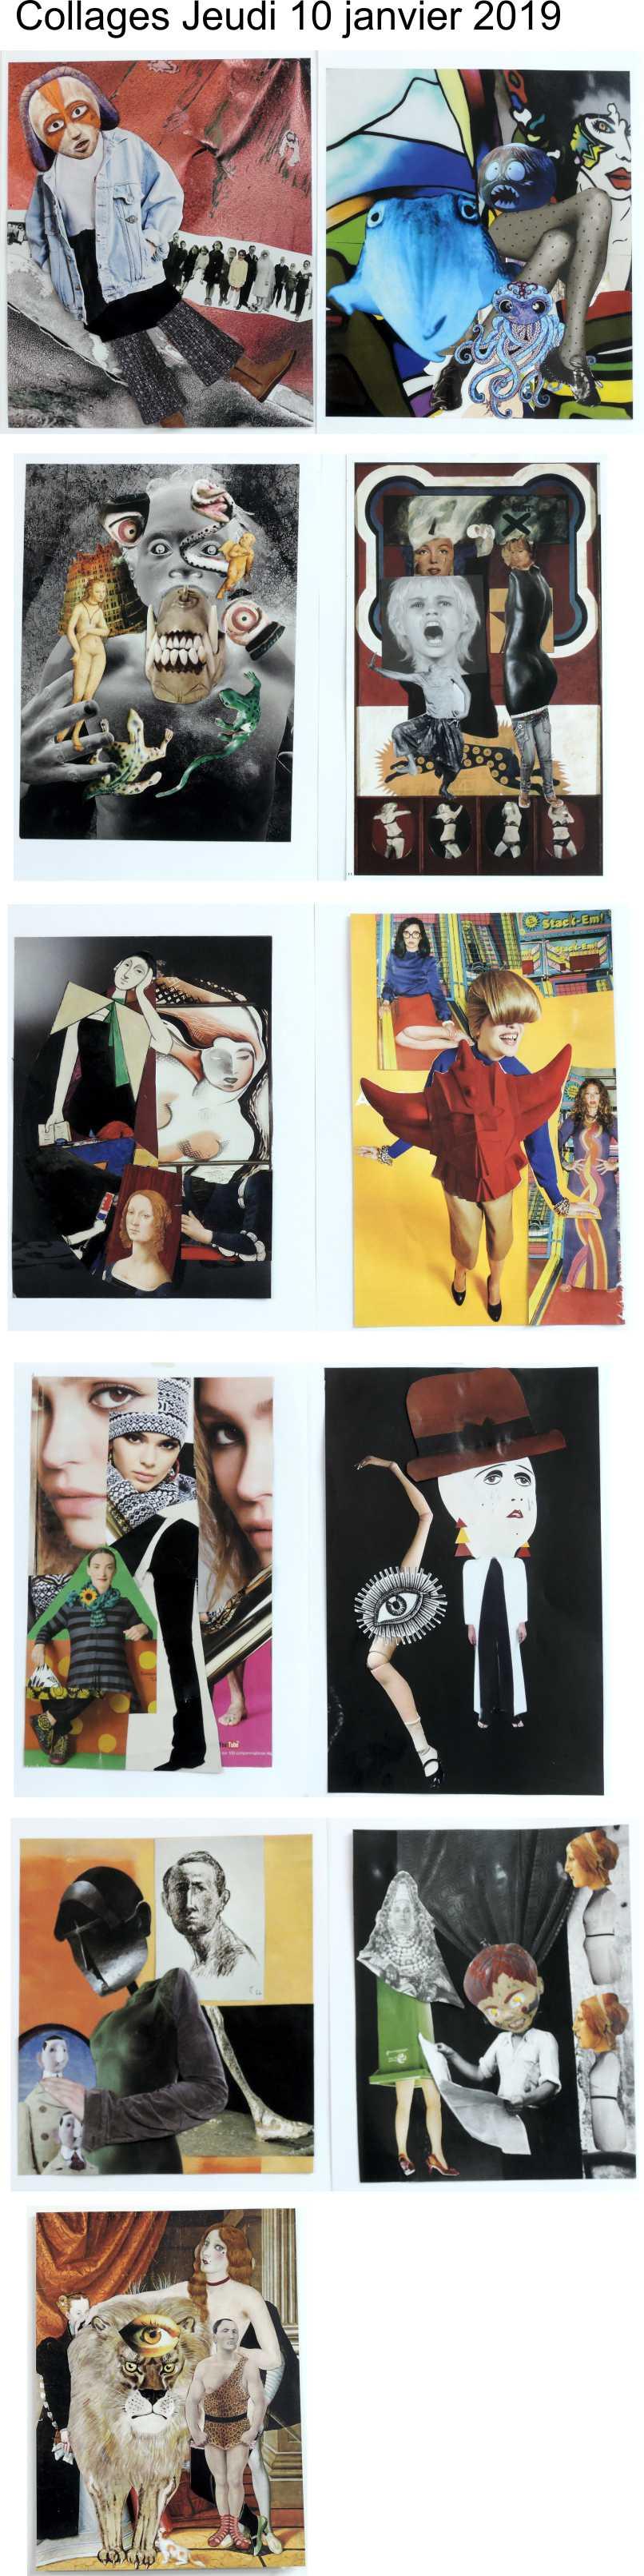 Collages jeudi 10 janvier 2019 Hannah Höch